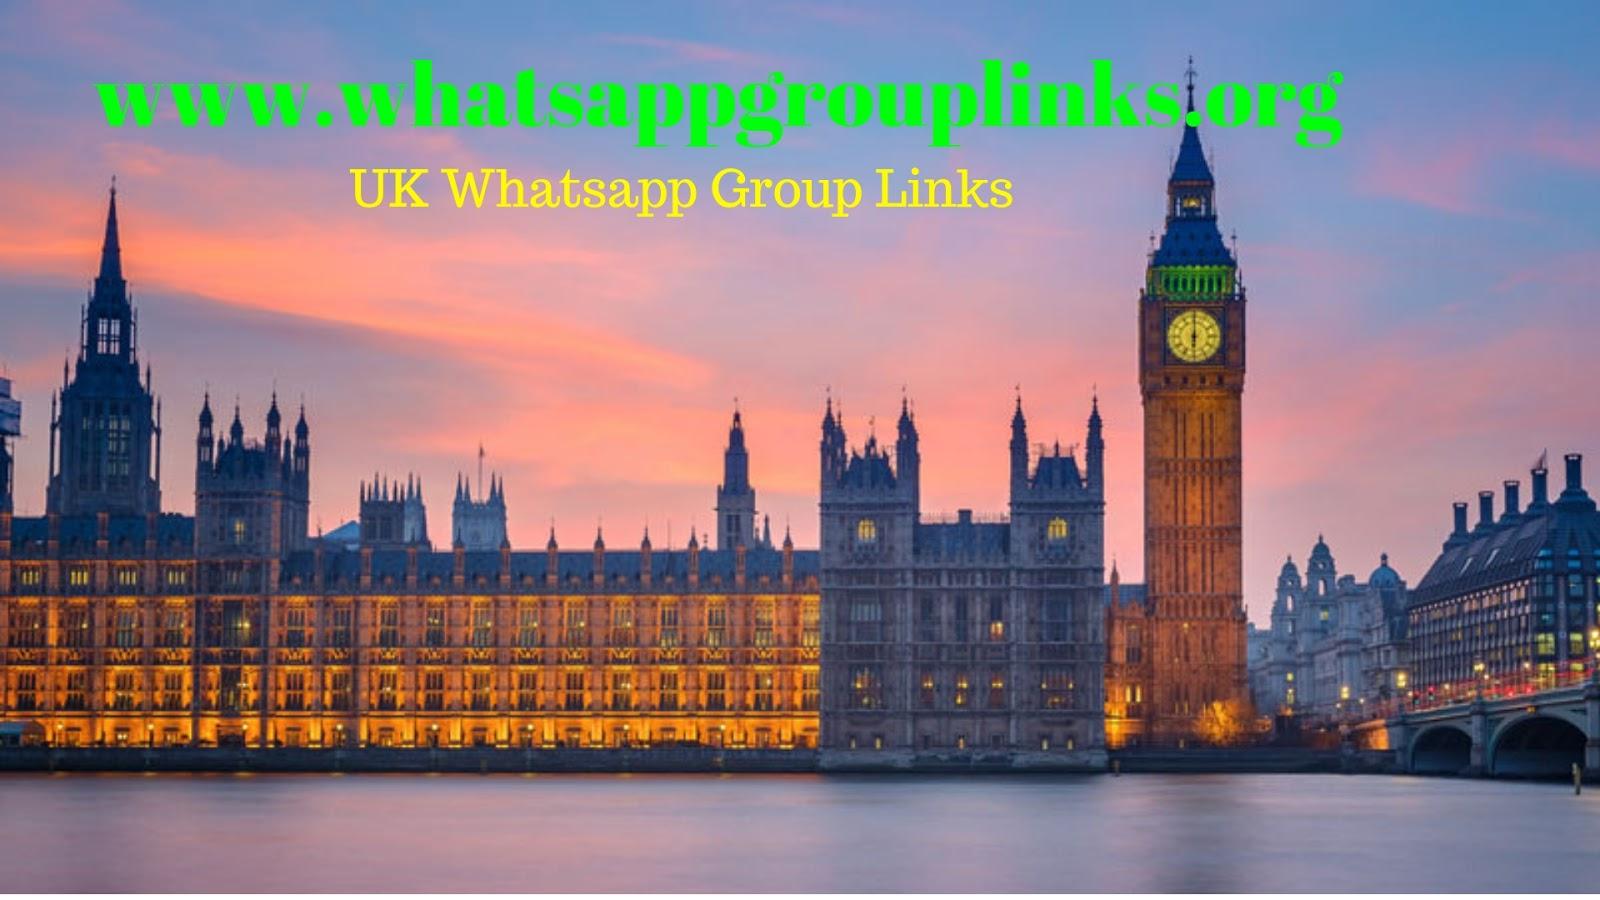 JOIN UK WHATSAPP GROUP LINKS LIST - Whatsapp Group Links